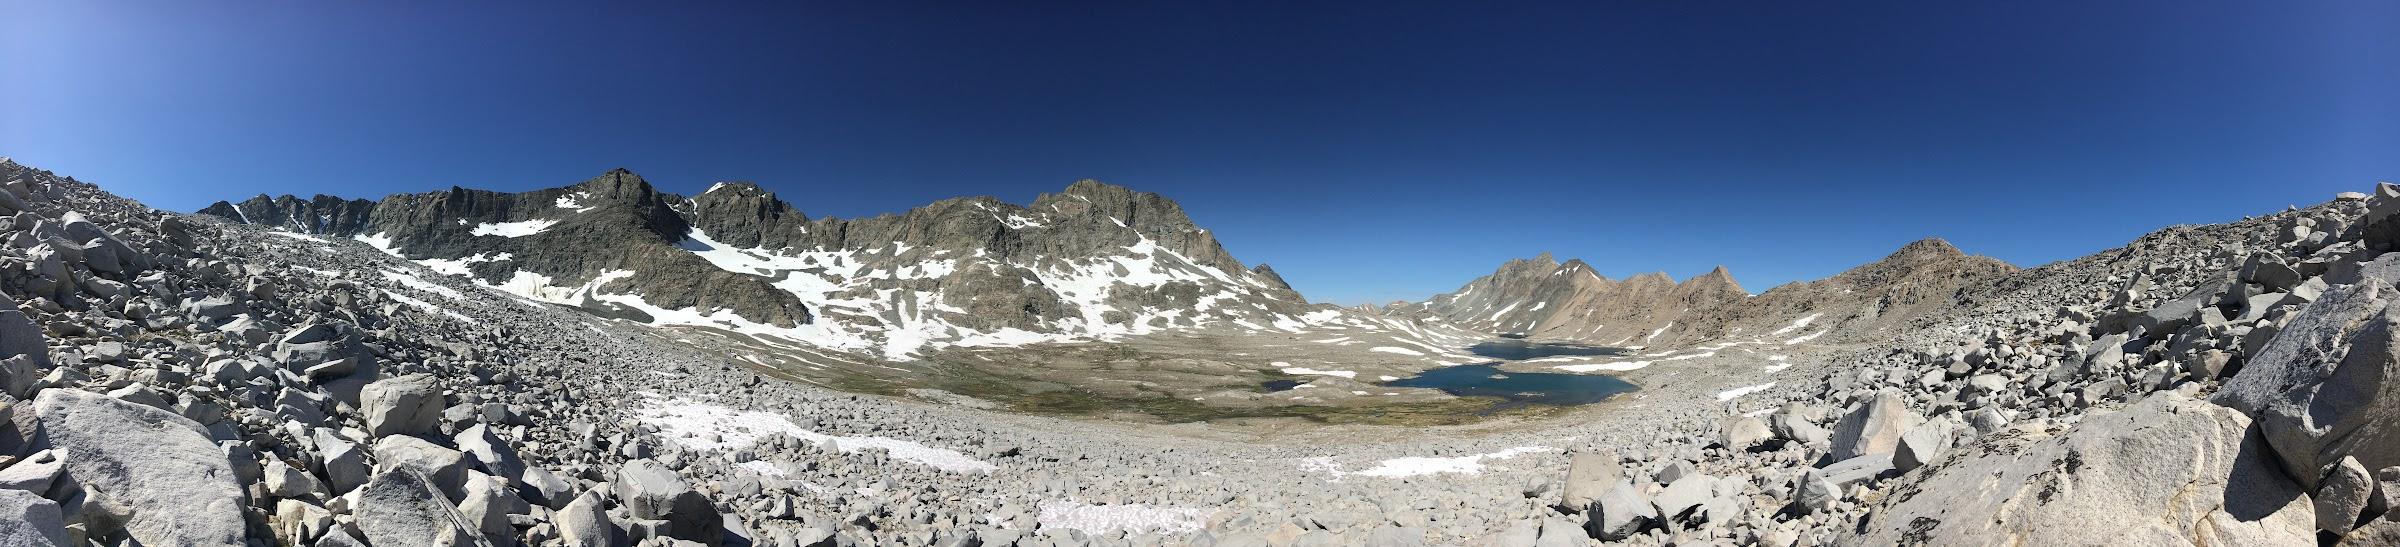 North Face Mount Goddard and Davis Lakes